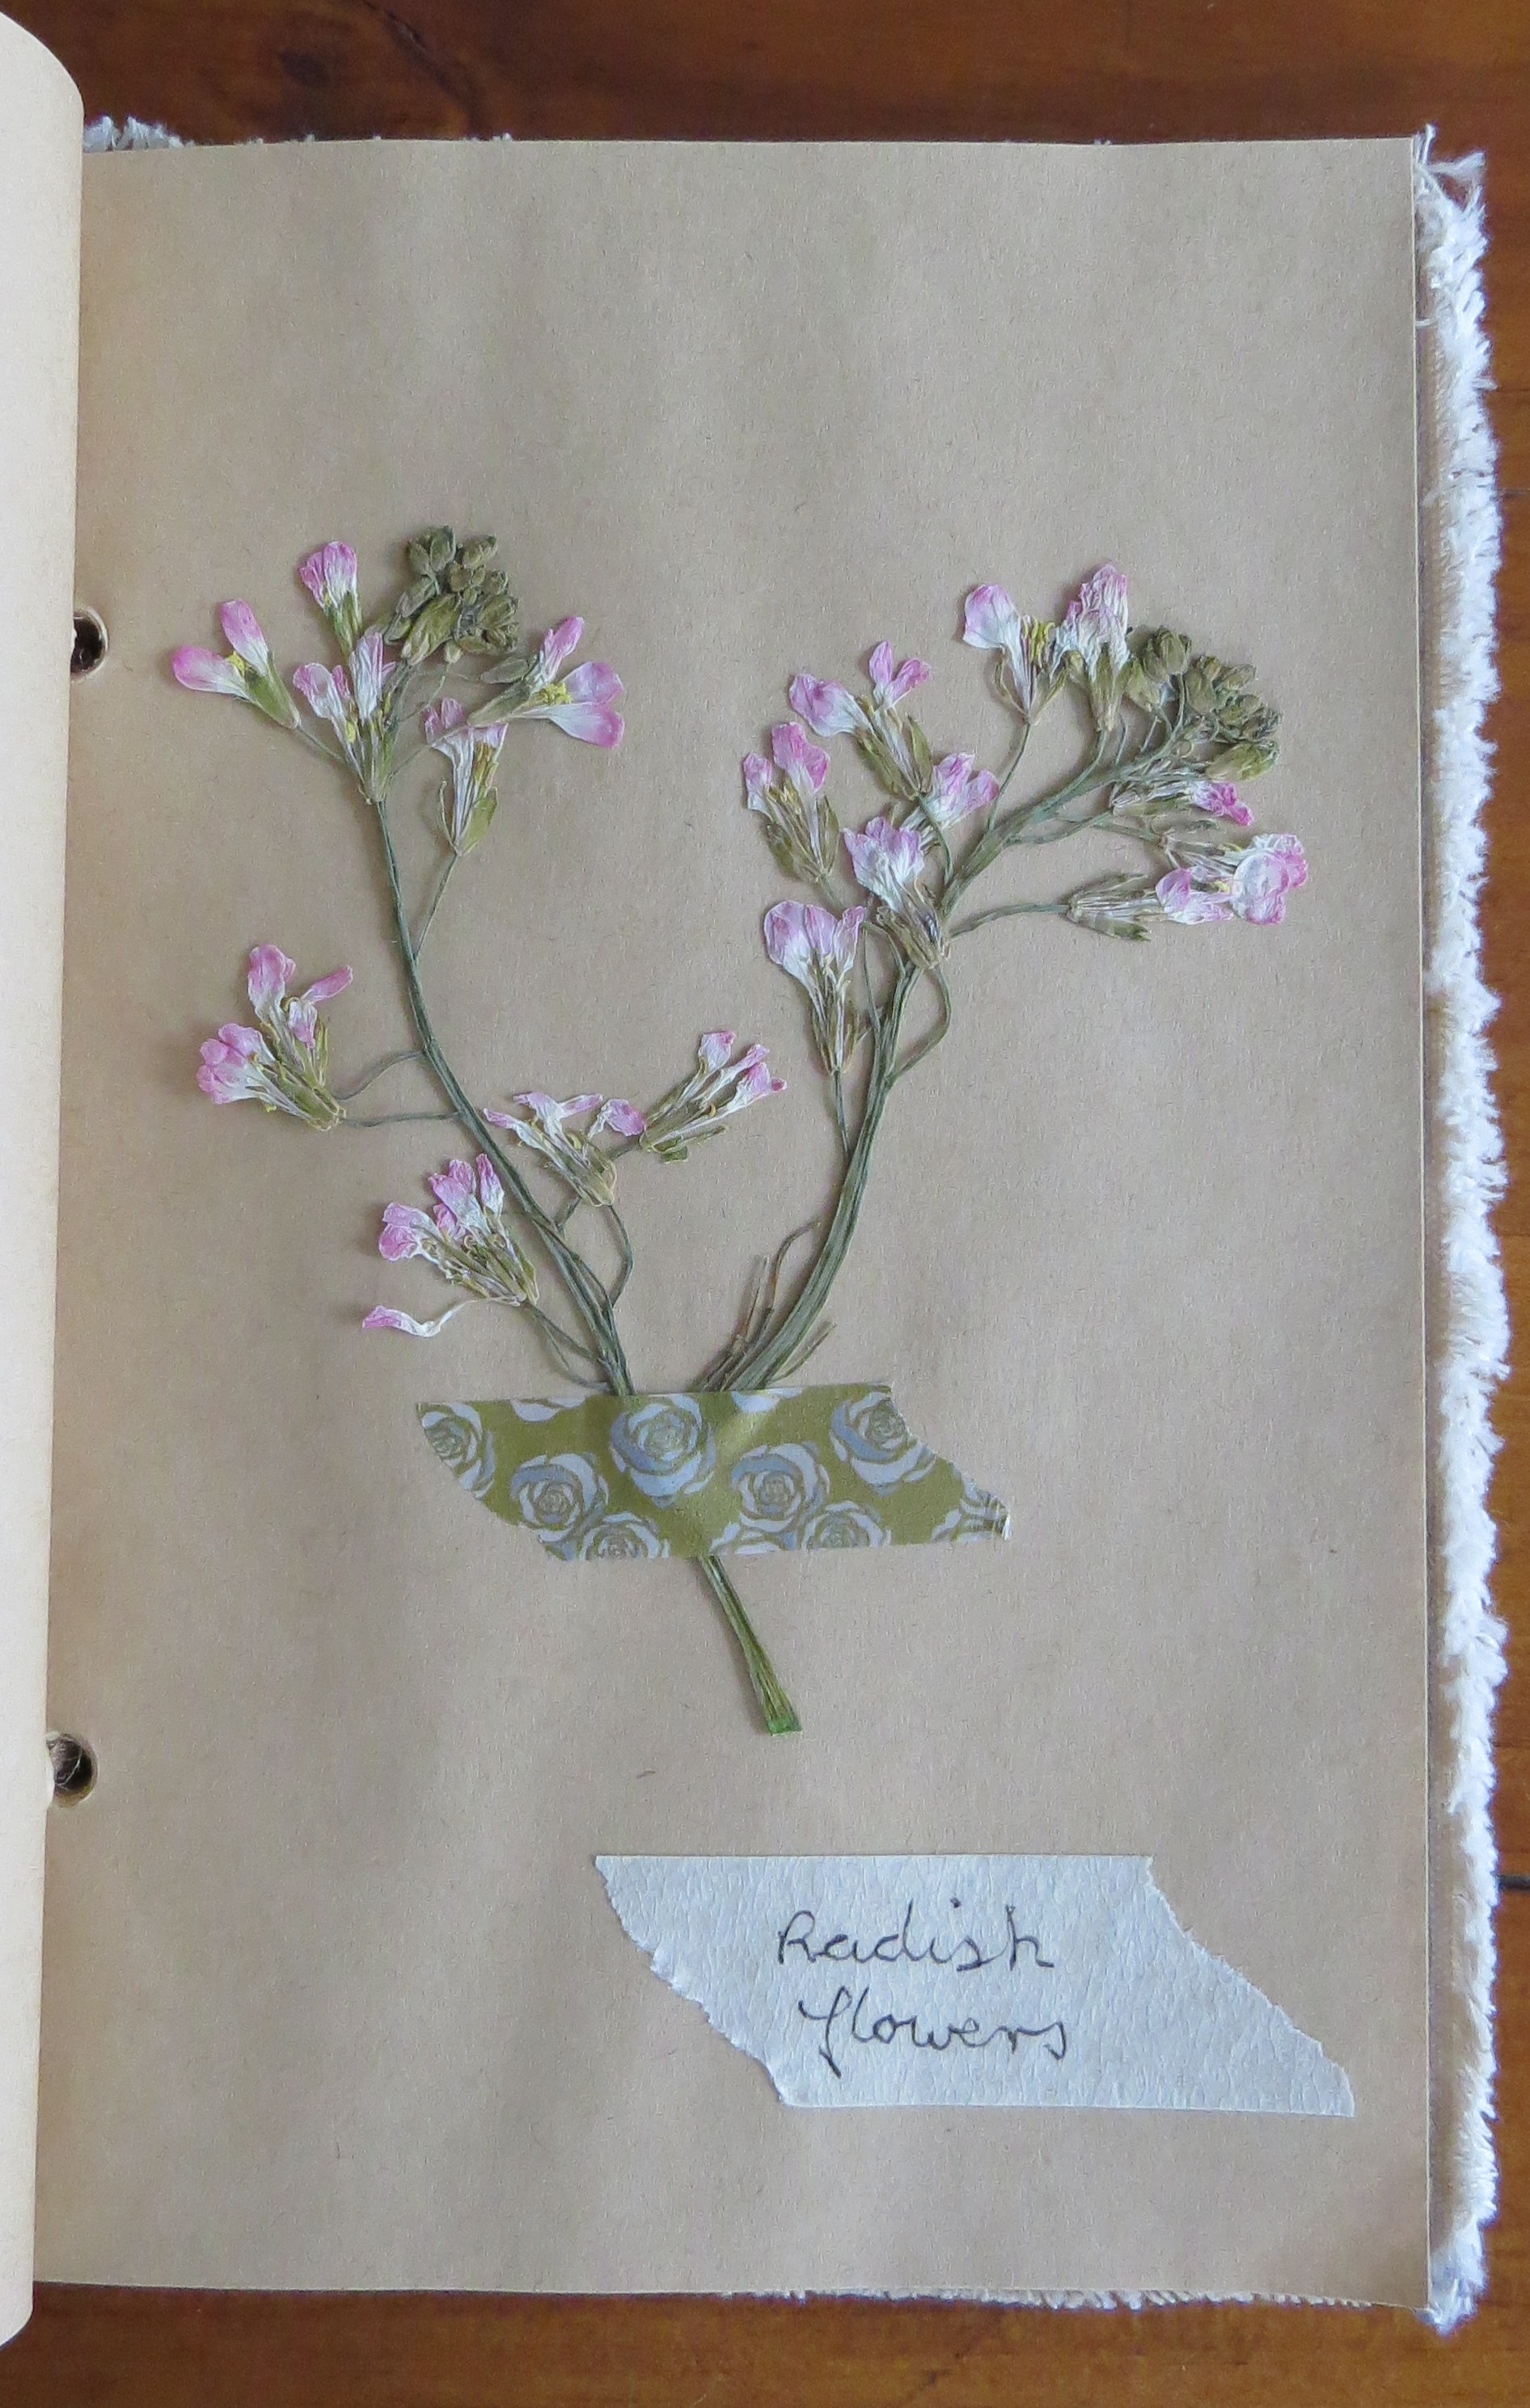 How to scrapbook pressed flowers - Radish Flowers